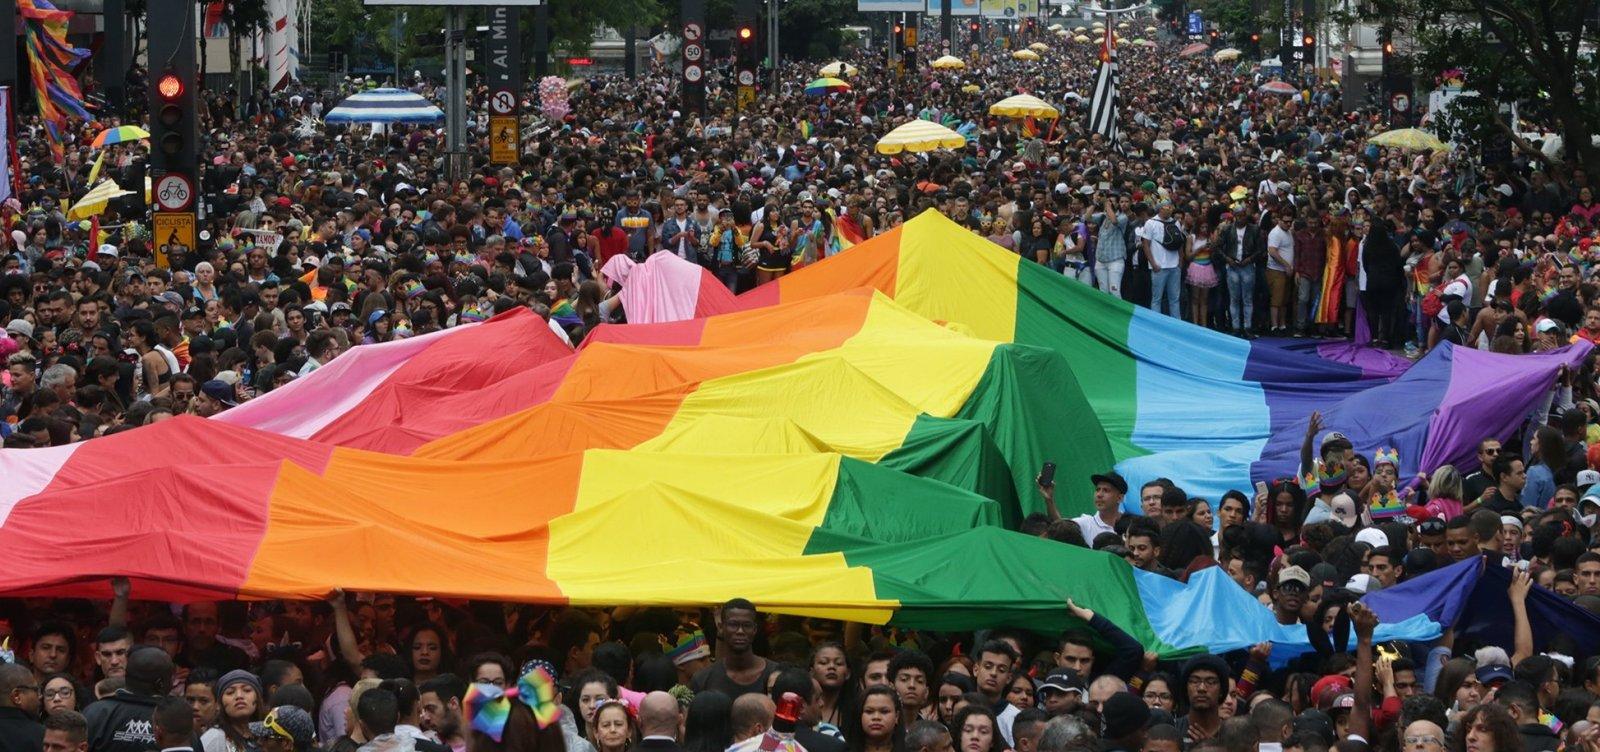 Candidaturas de transexuais e travestis batem recorde